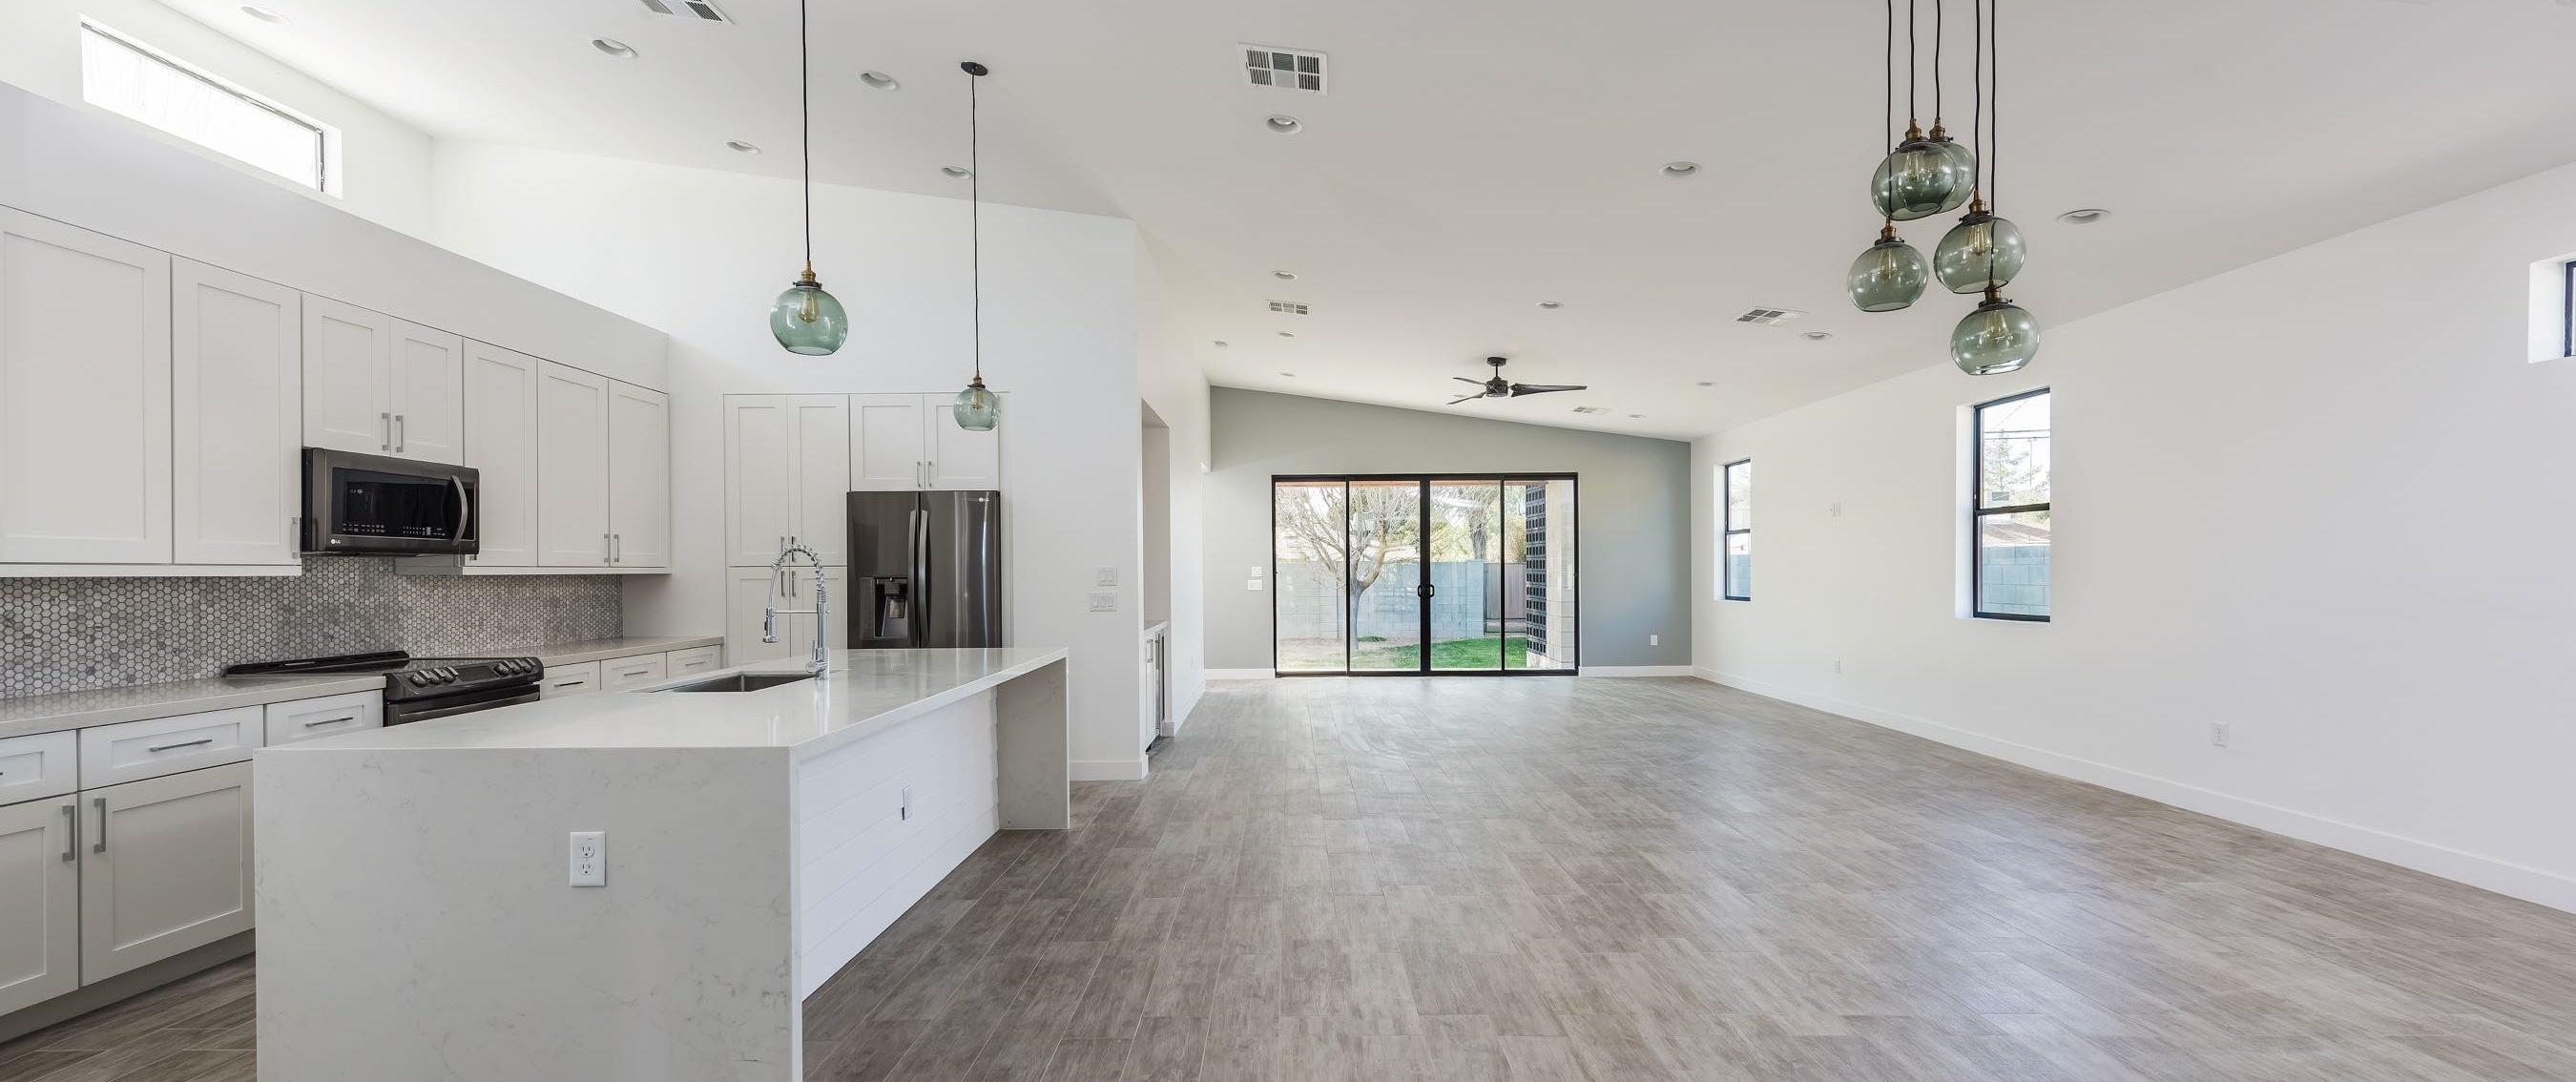 4234 N 18th Pl, Phoenix, AZ 85016   Home For Sale In Biltmore Phoenix